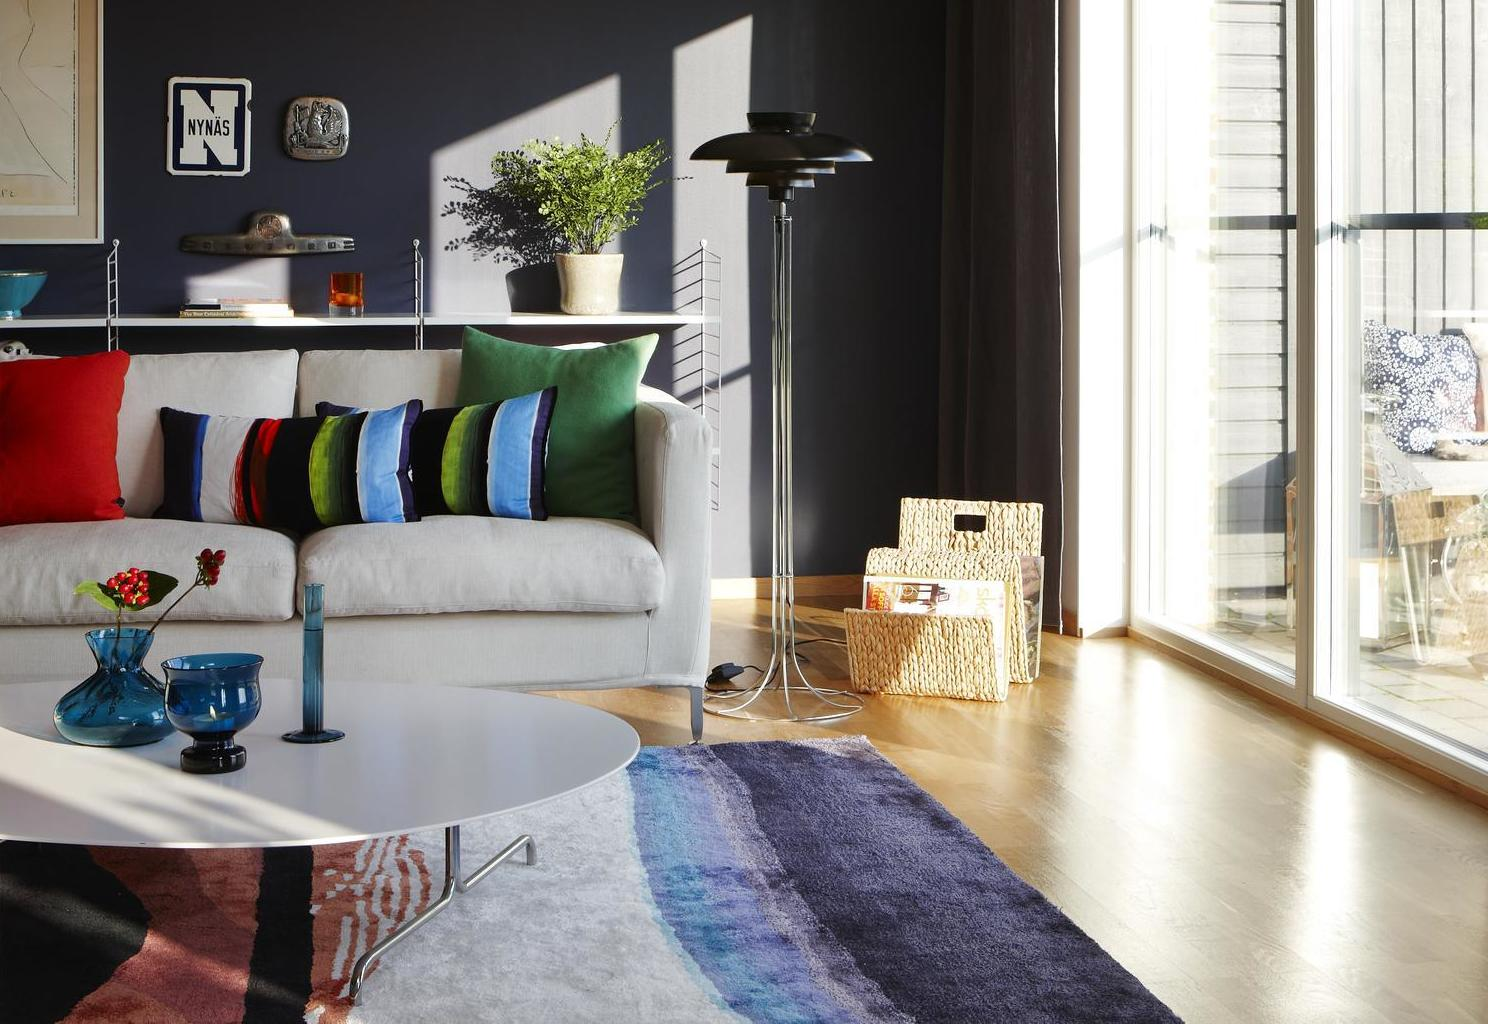 vardagsrum vit soffa färgglad matta